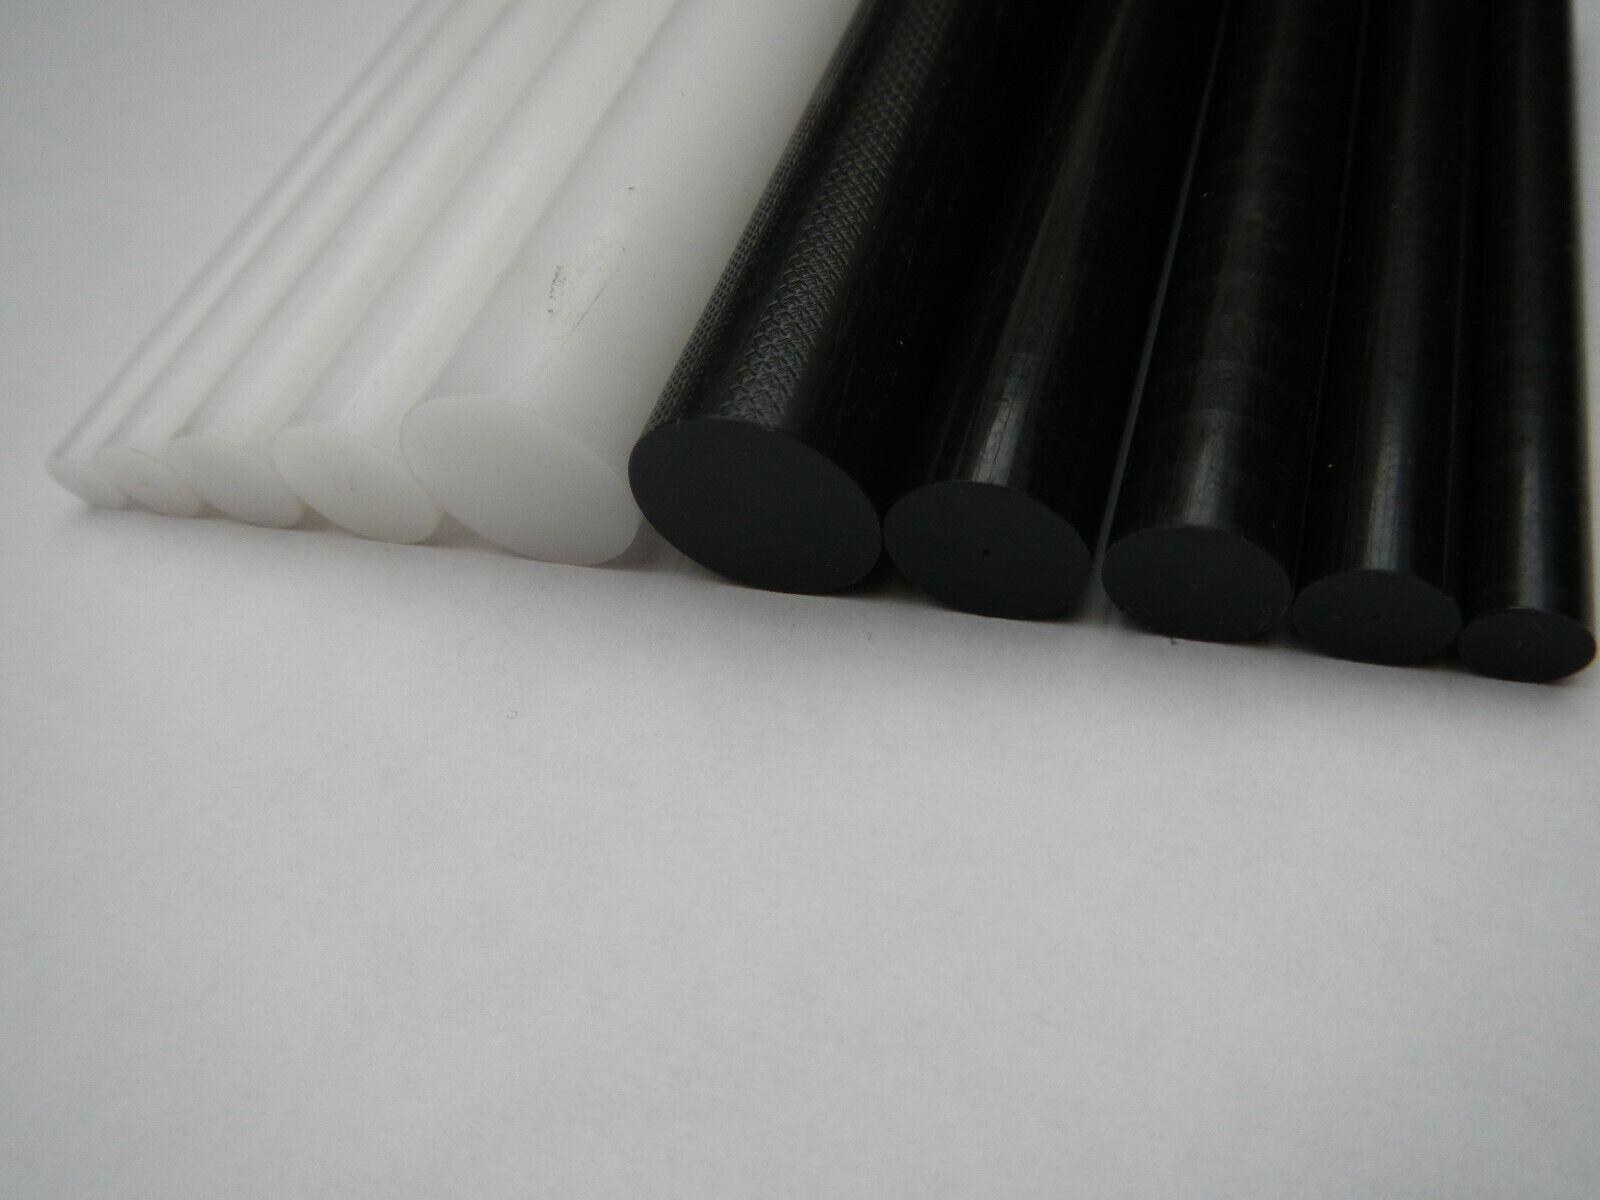 Acetal Rod Black White delrin nylon Plastic Round Bar 6mm 8mm 10mm 12mm 22mm 25m